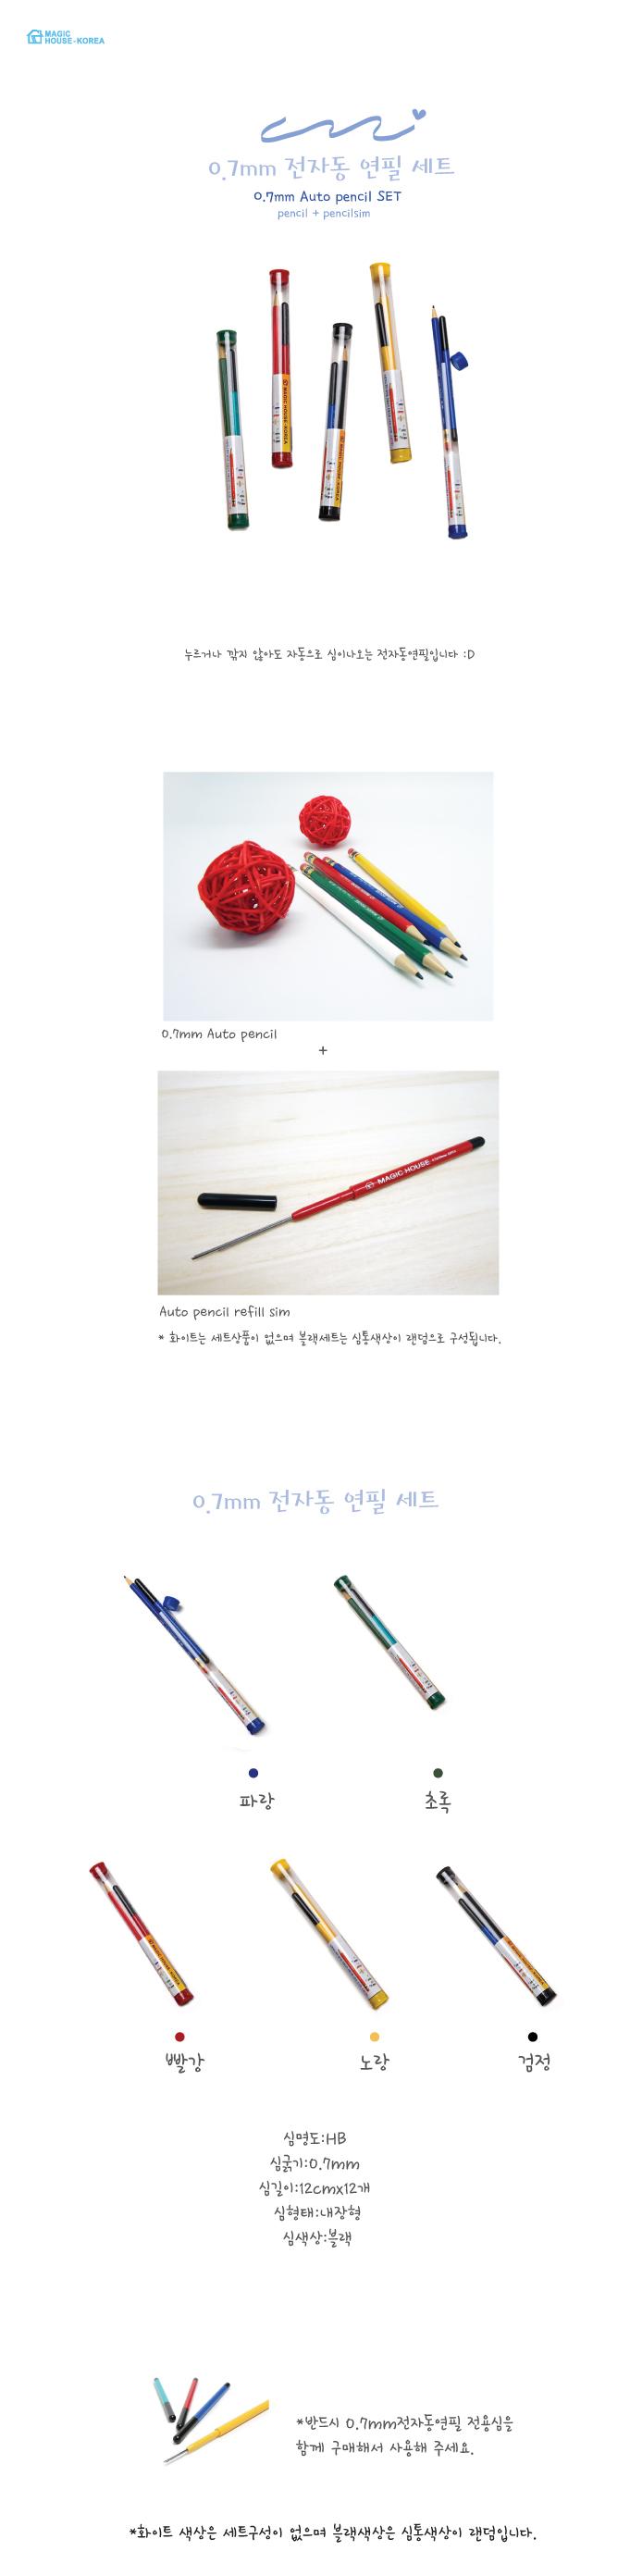 0.7mm전자동연필+전용심SET - 매직하우스, 3,400원, 연필, 자동/기능성연필